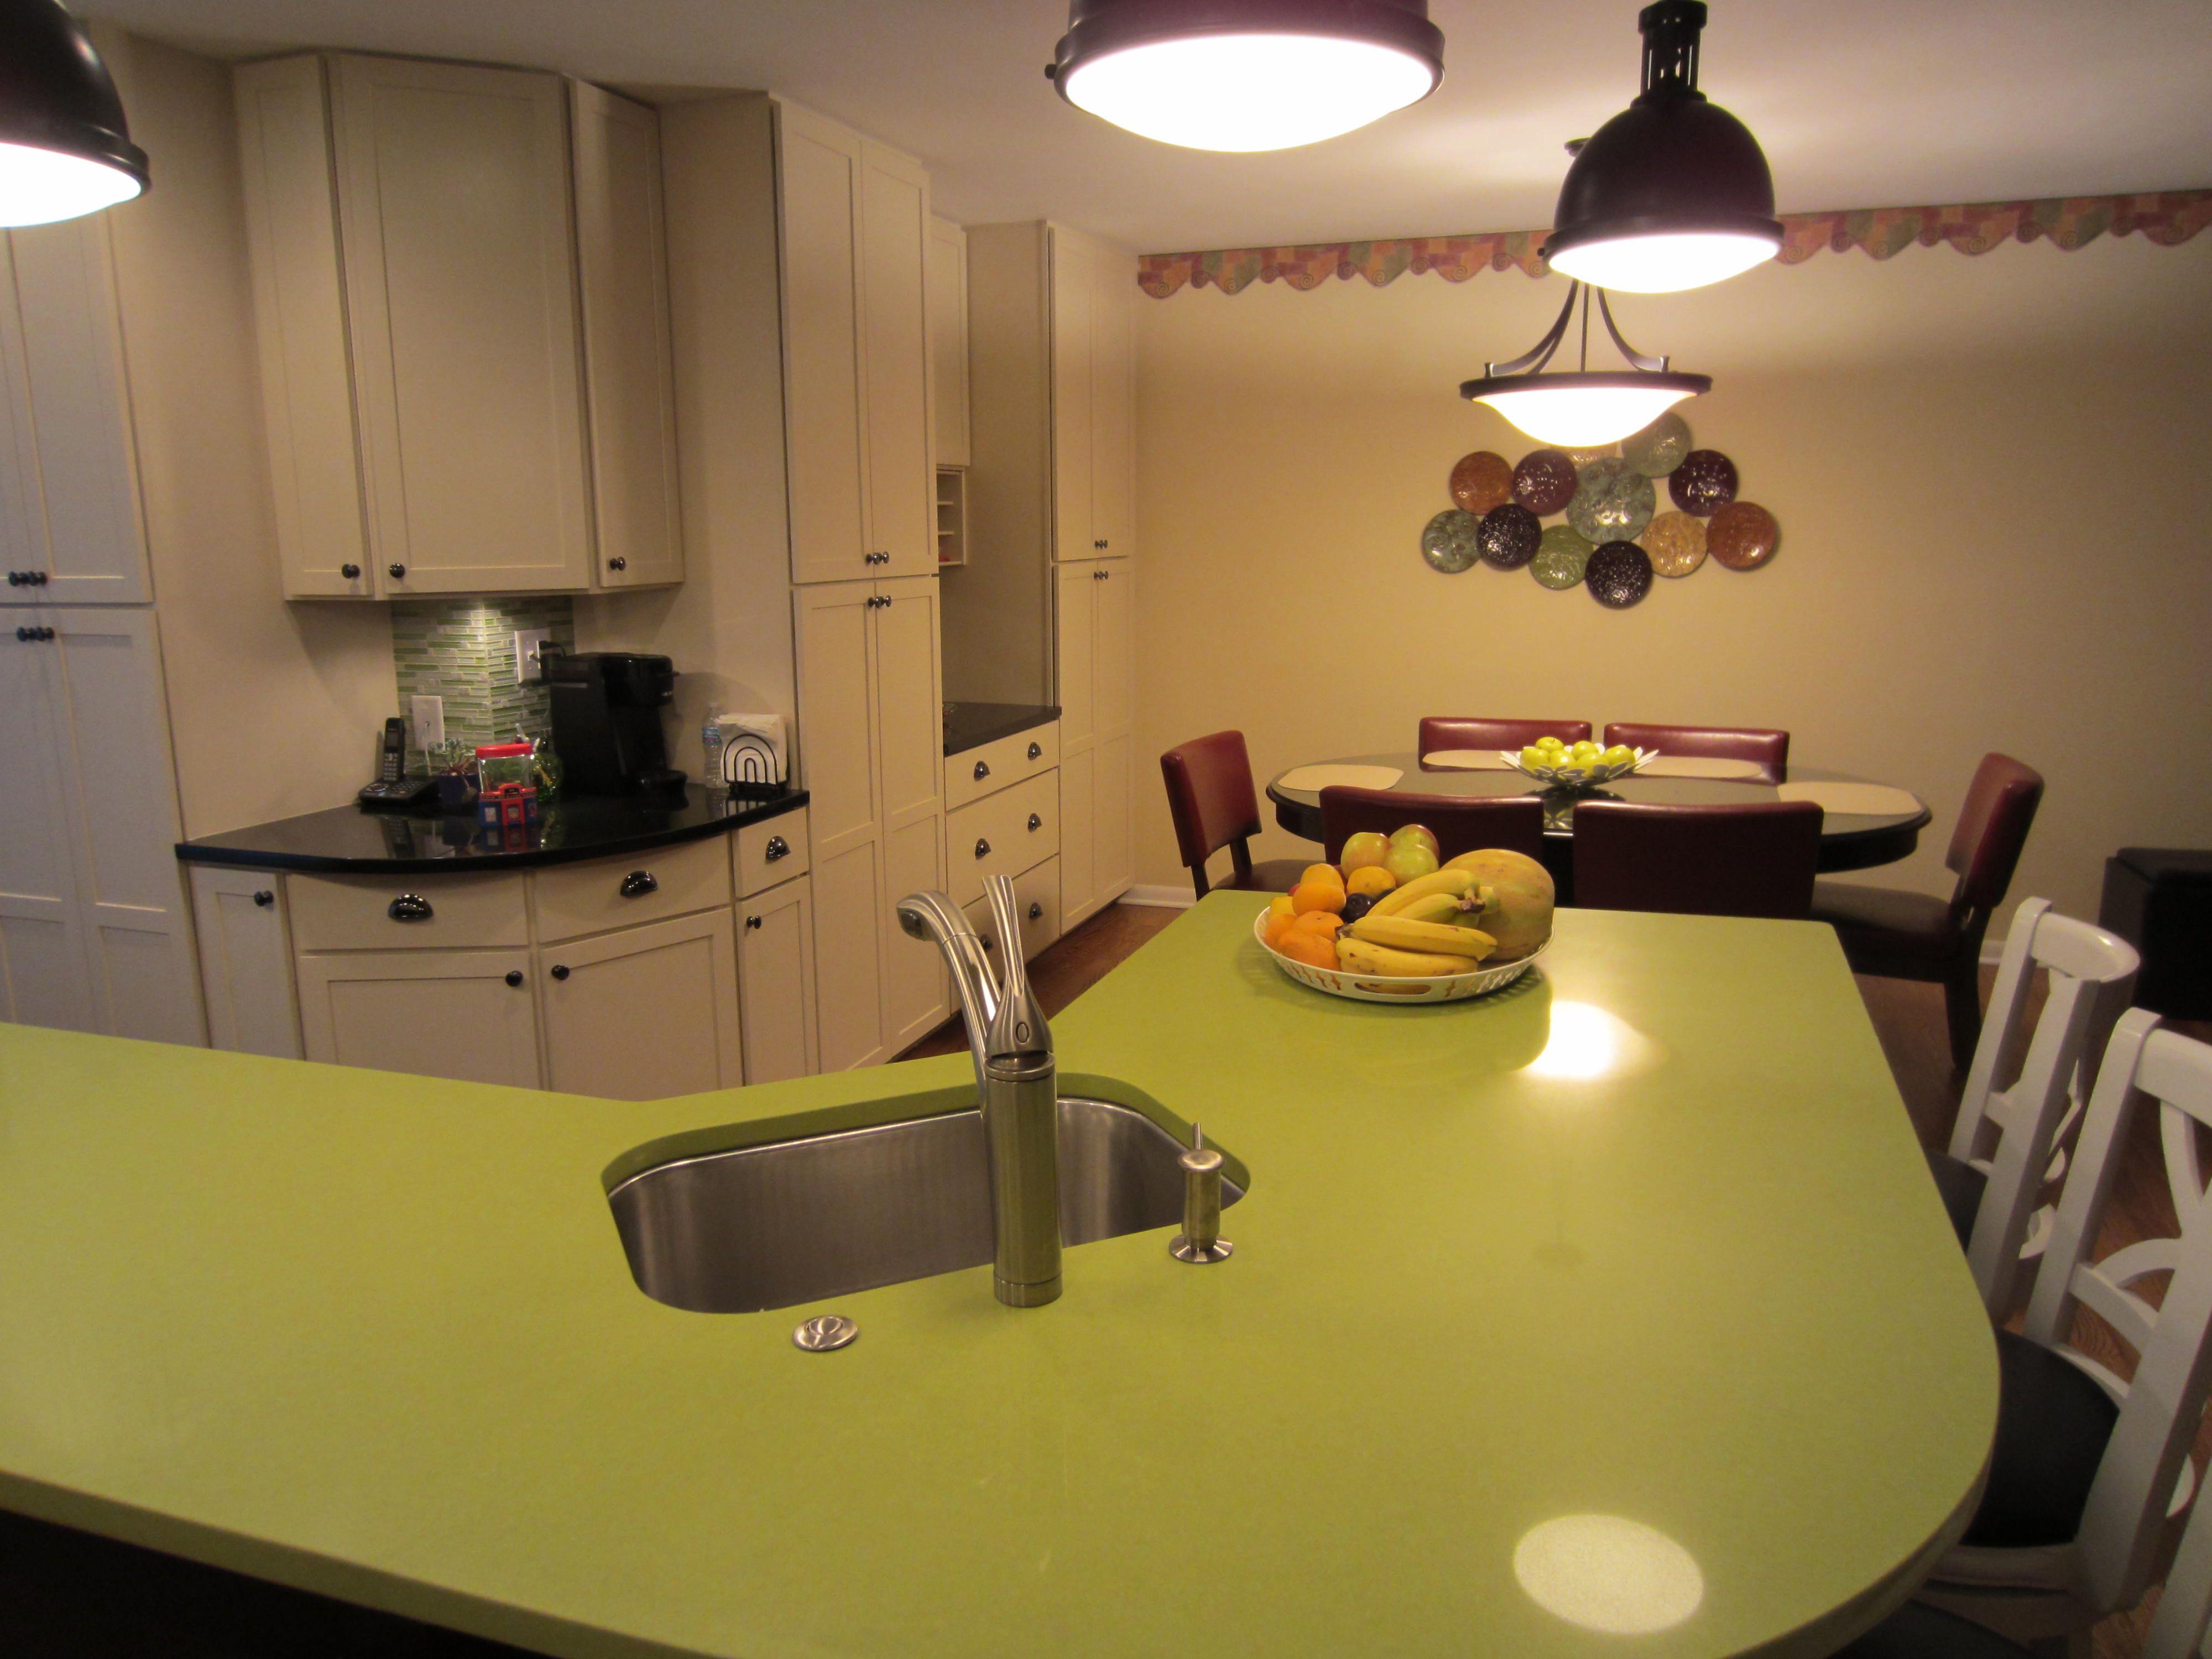 Apple Martini Green Quartz Counter Express Kitchen U0026 Bath Frankfort, IL